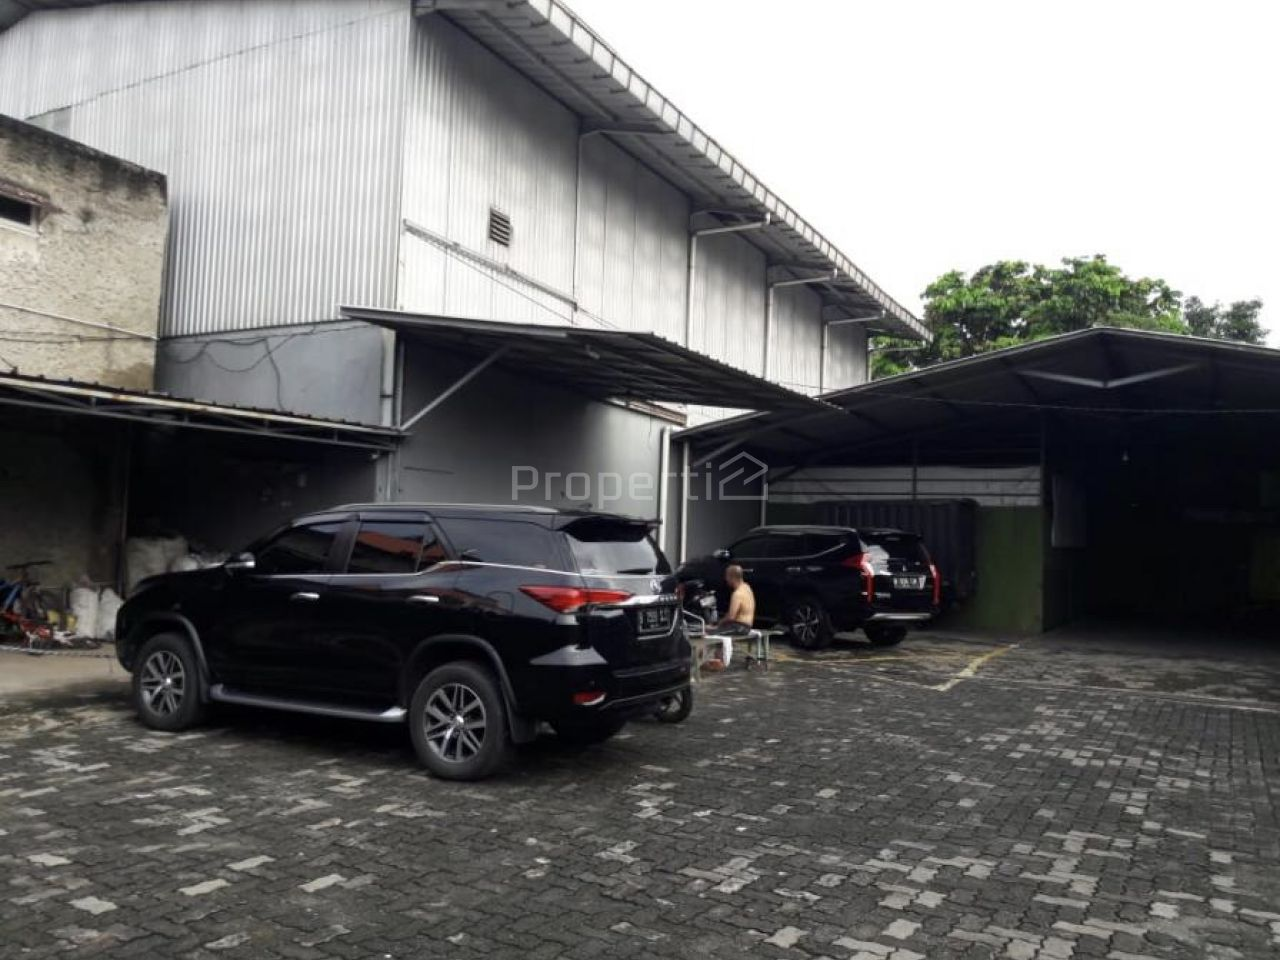 Commercial Land And Building at Palmerah, West Jakarta, DKI Jakarta